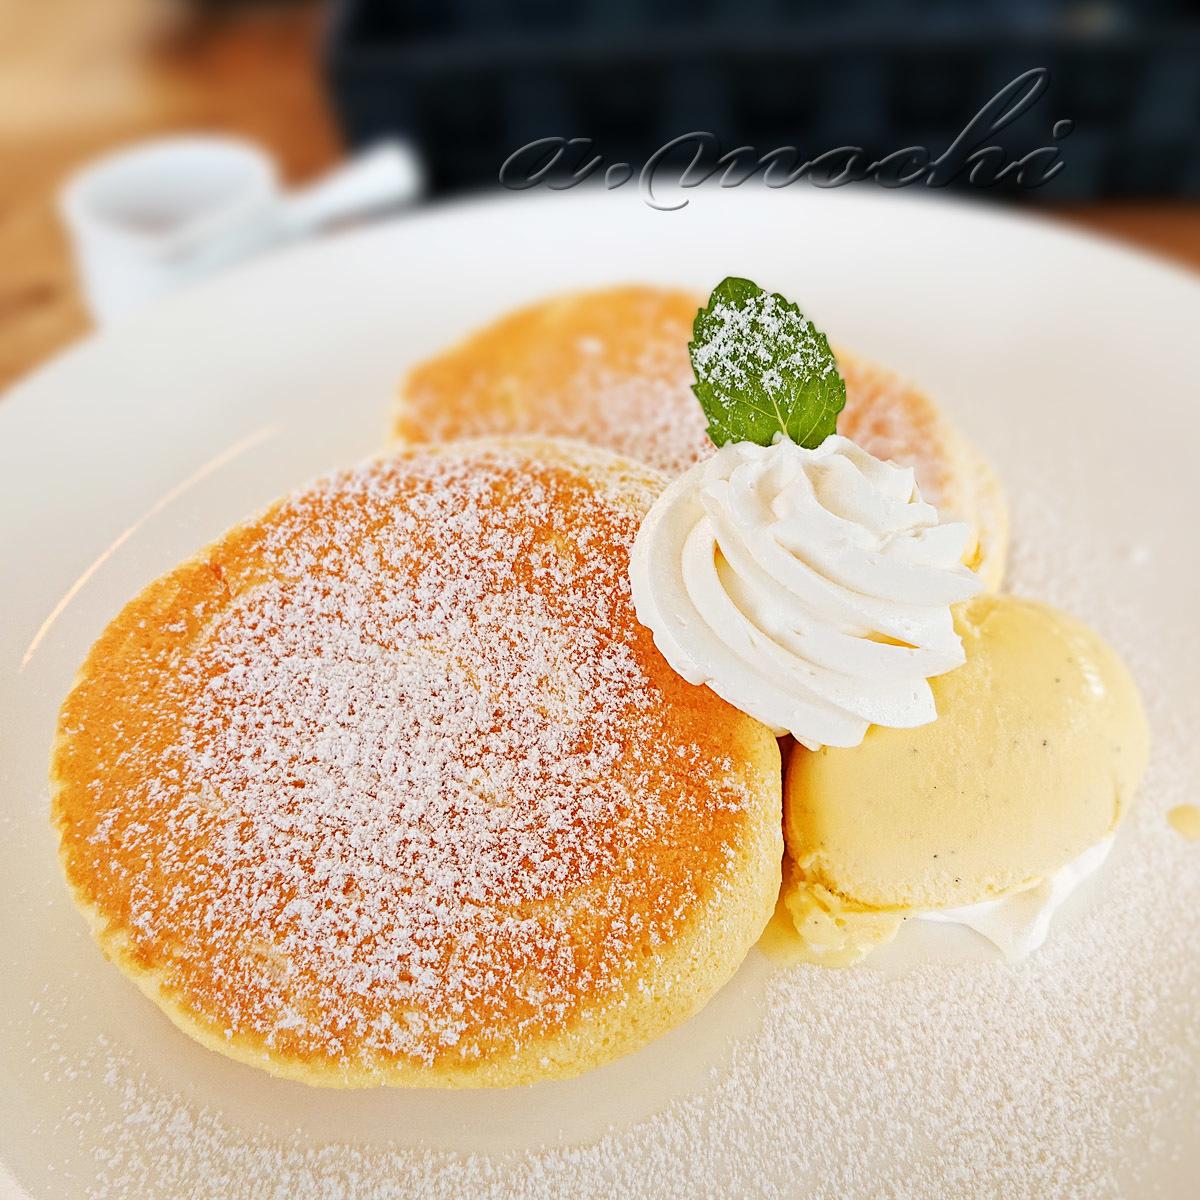 nesso_pancake.jpg